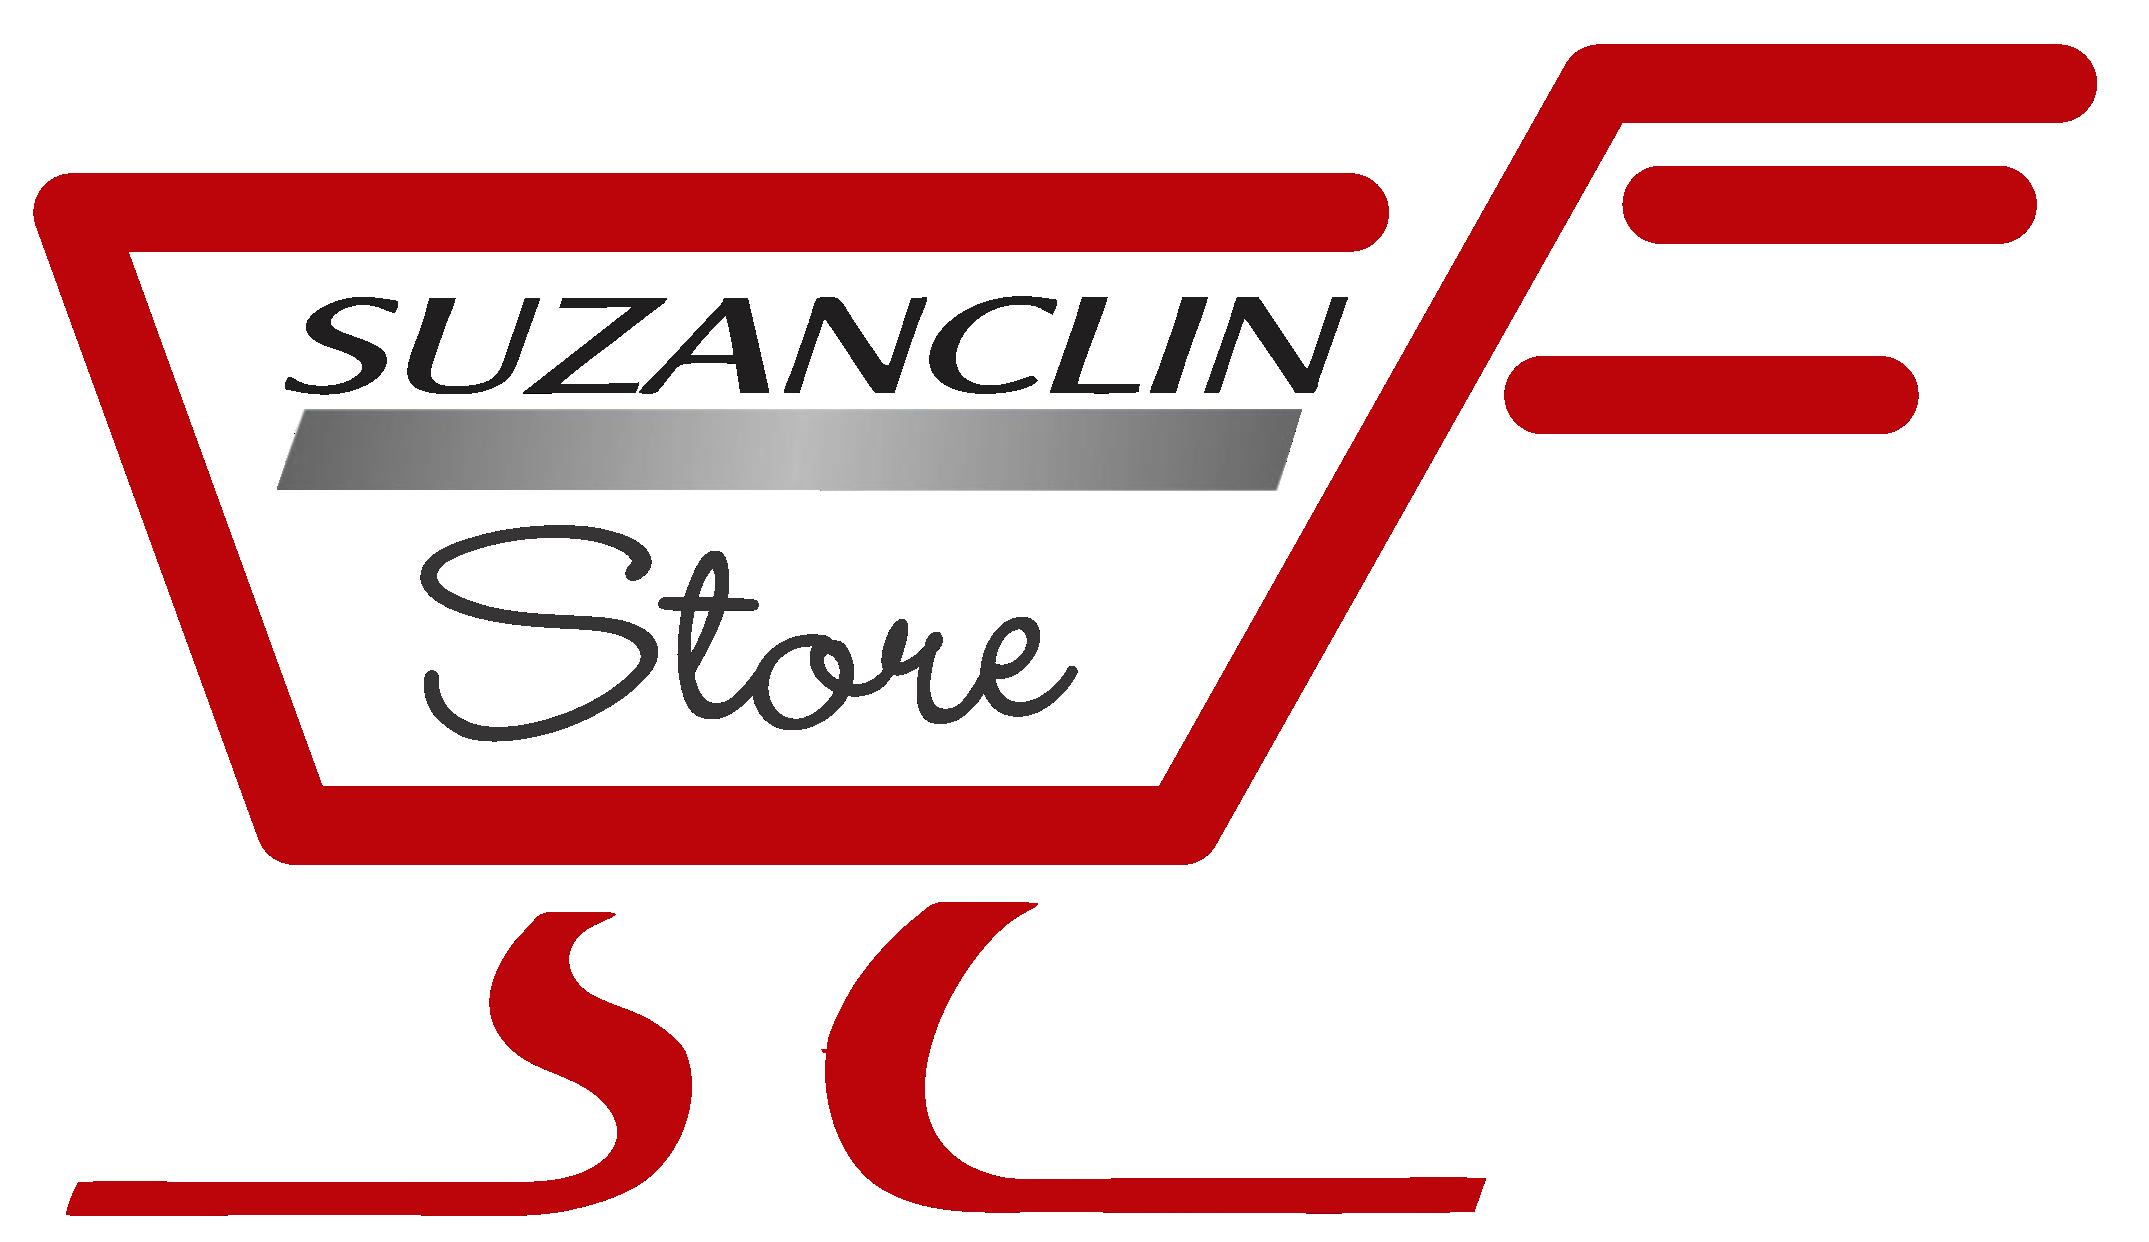 Suzanclin Store